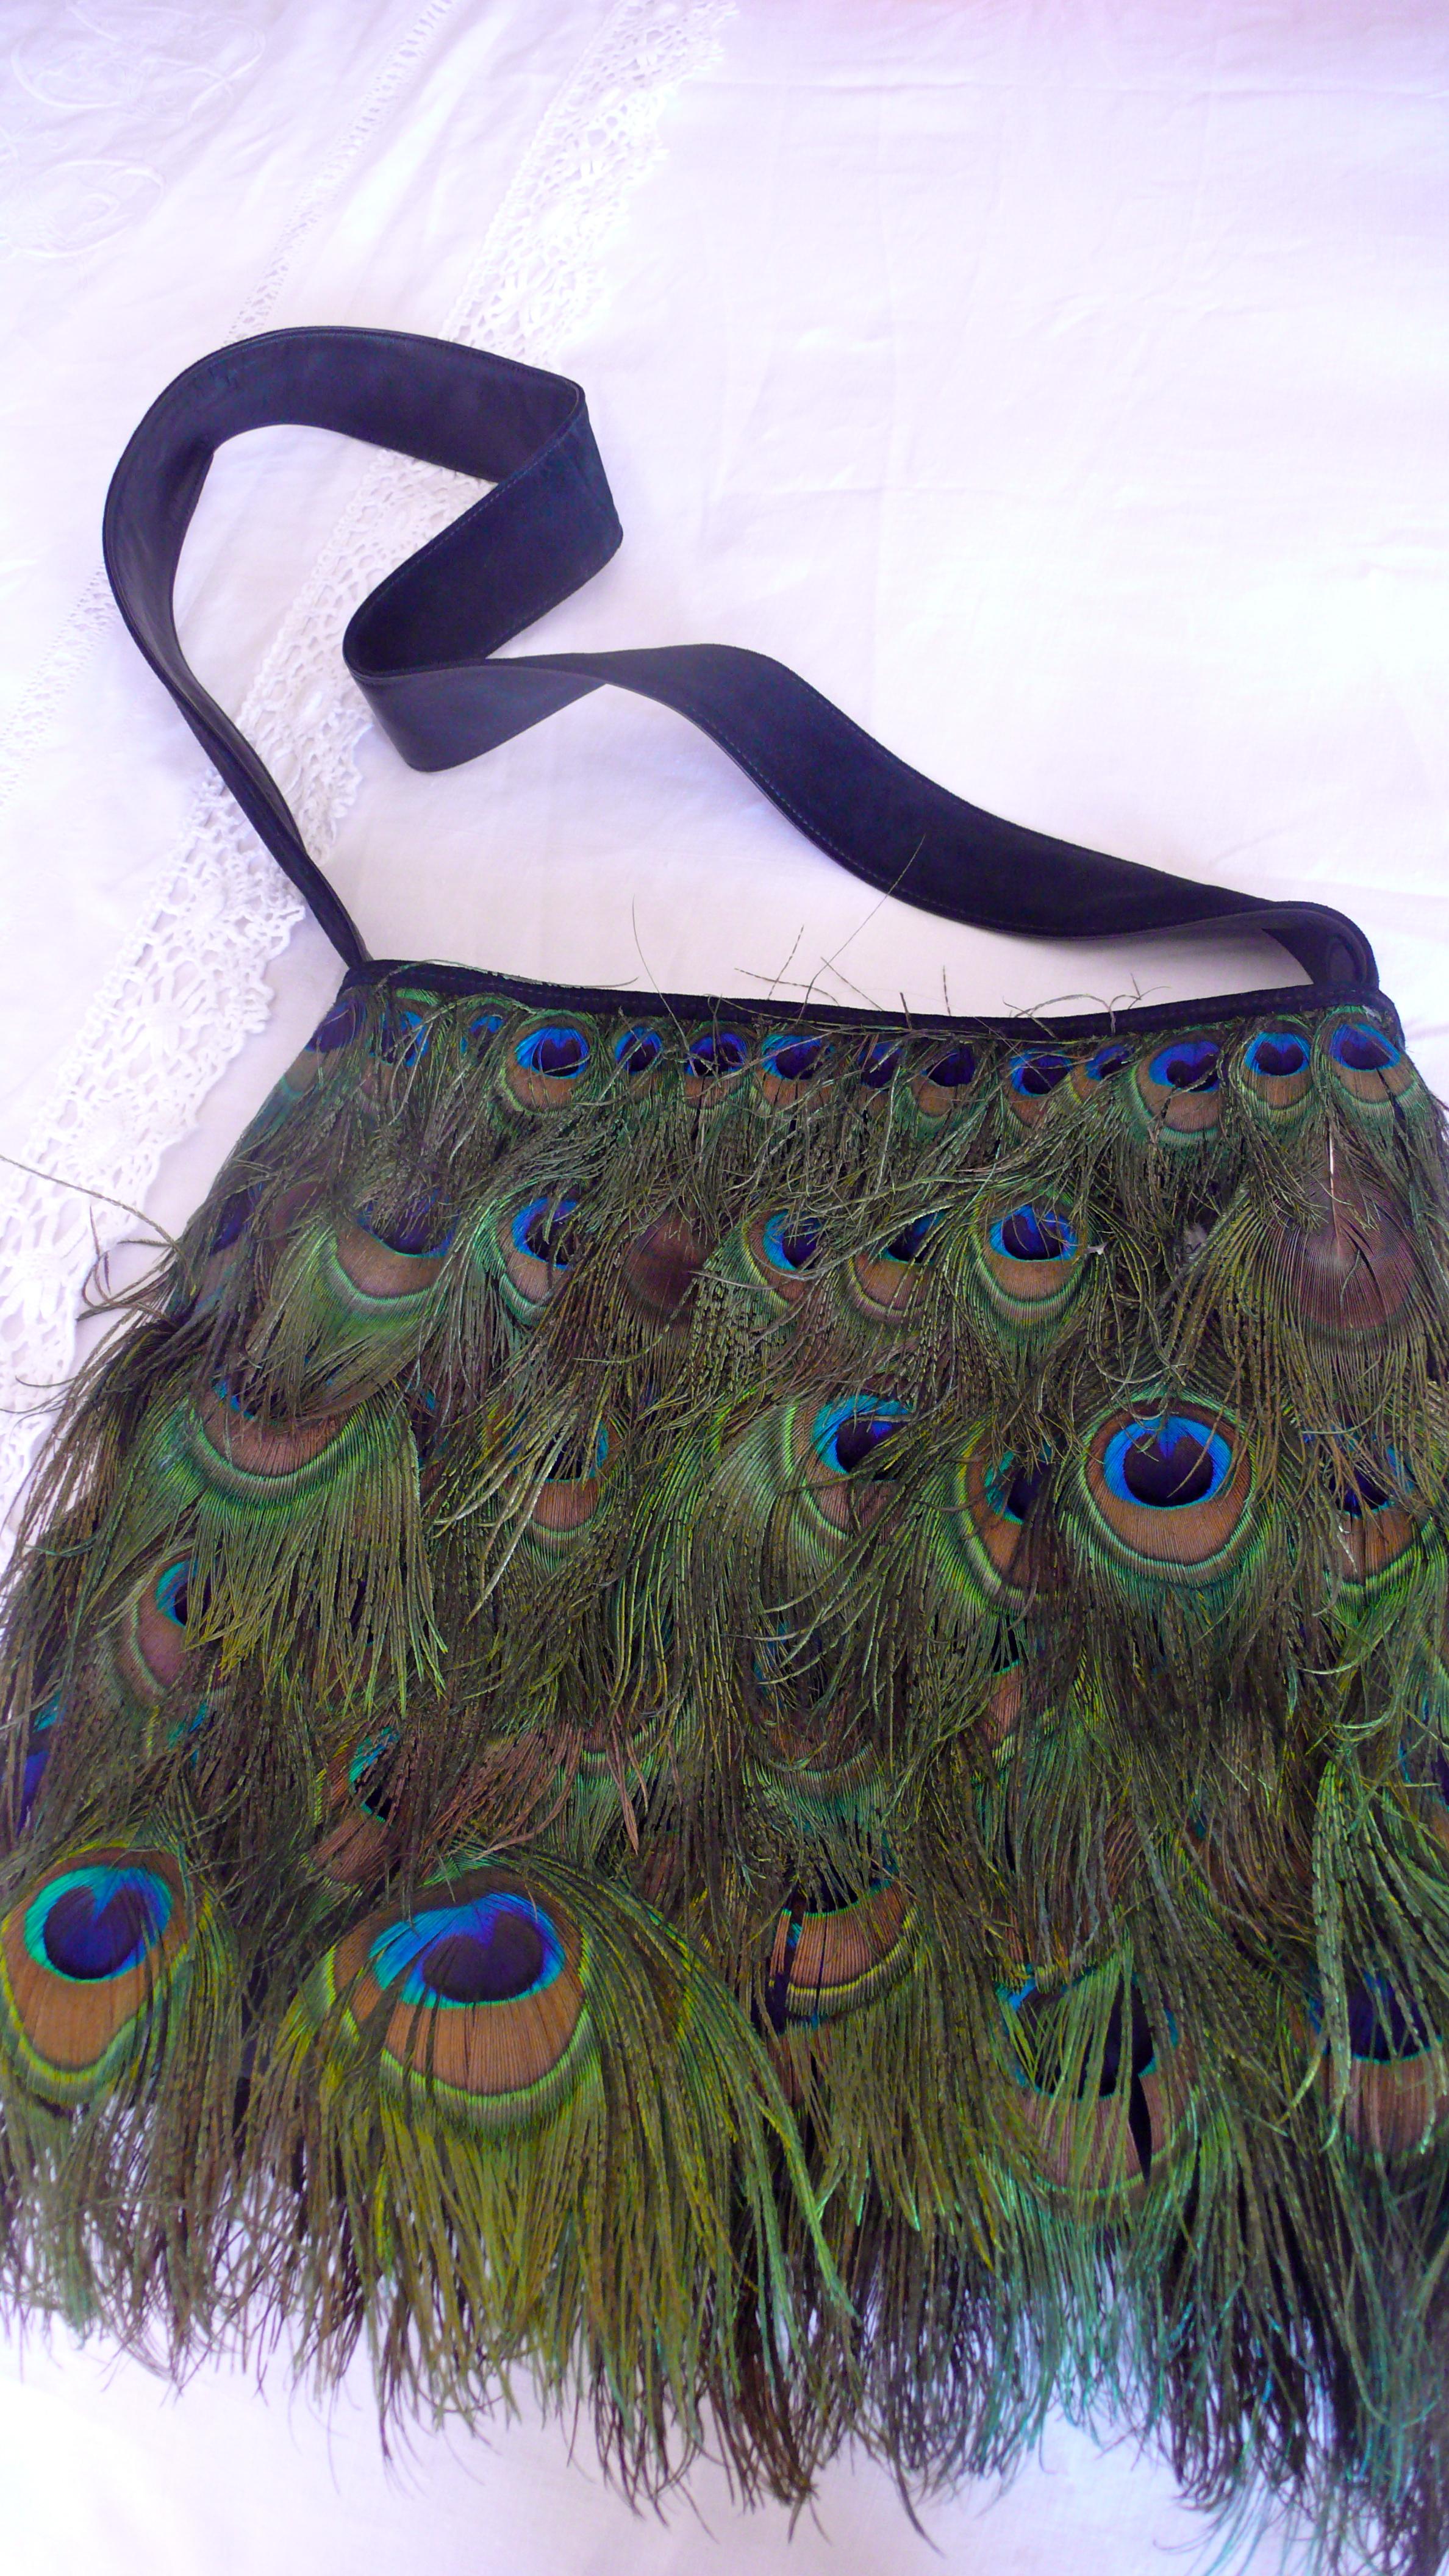 #Vintage Tom Ford #Gucci peacock bag , slimpaley.com